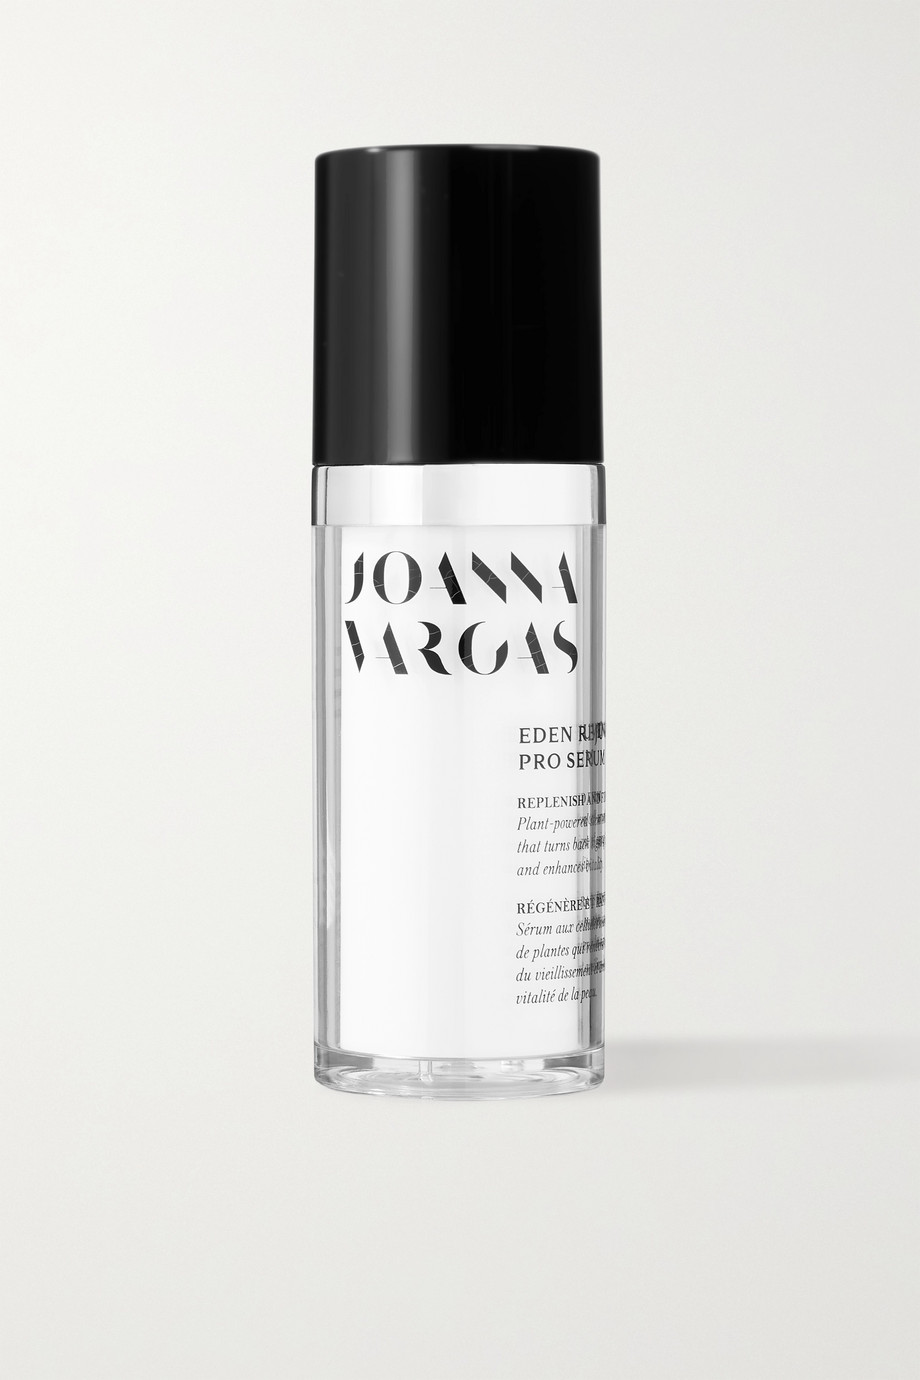 Joanna Vargas Eden Rejuvenating Pro Serum, 30 ml – Serum